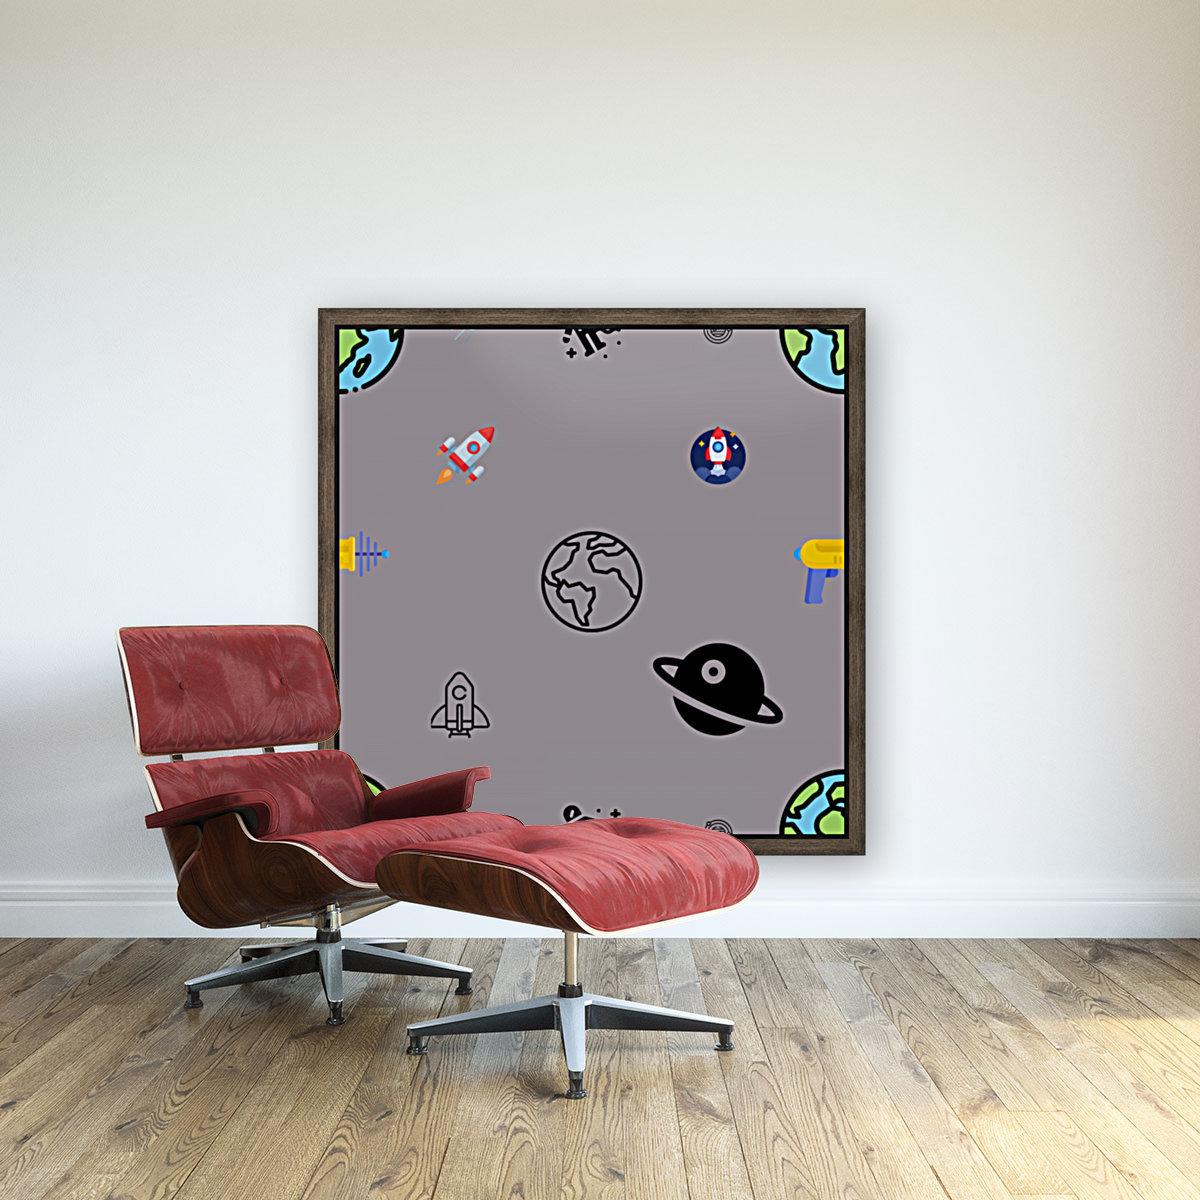 Space (5)_1560183087.2915  Art